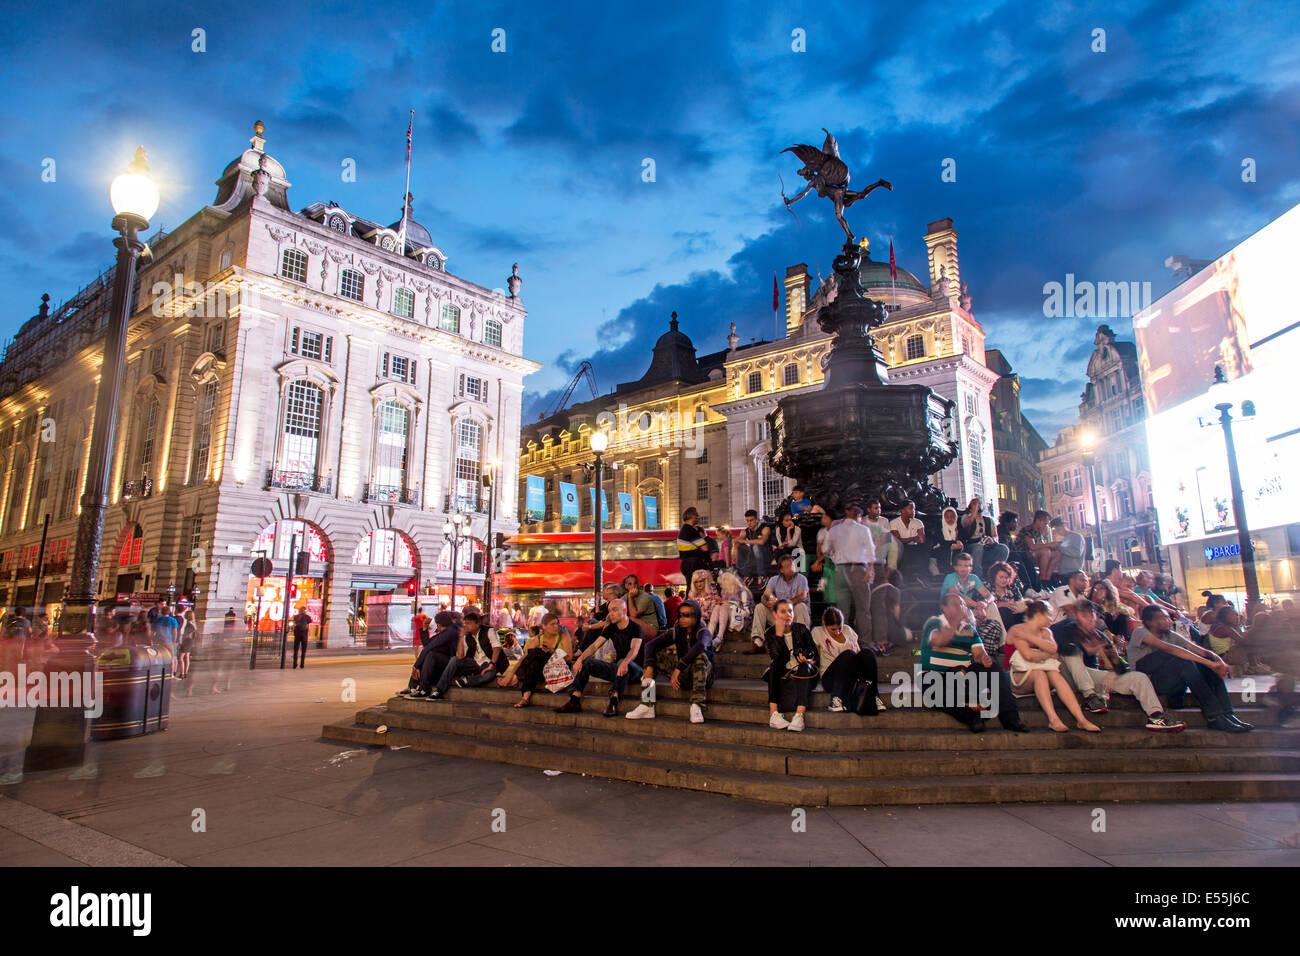 Piccadilly Circus London UK - Stock Image